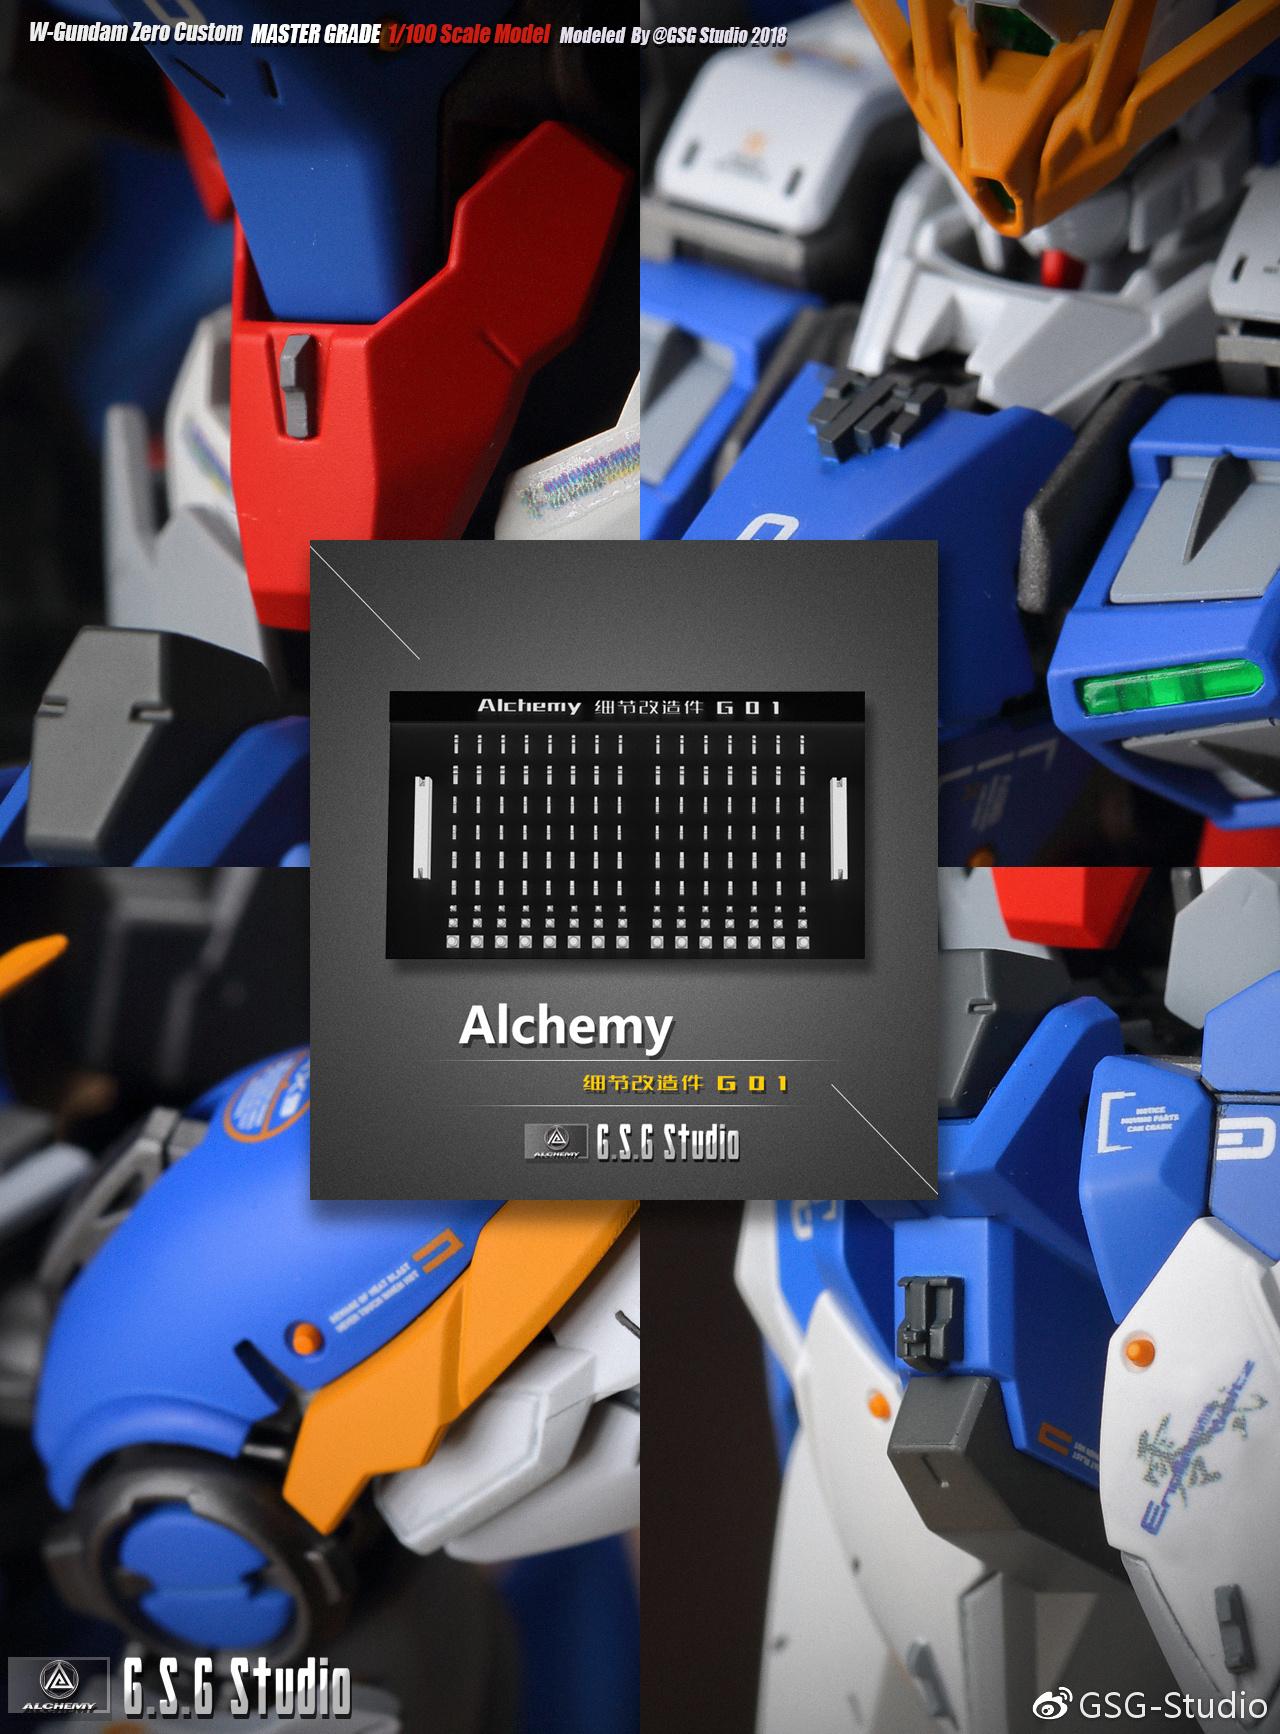 S274_alchemy_detail_up_inask_010.jpg